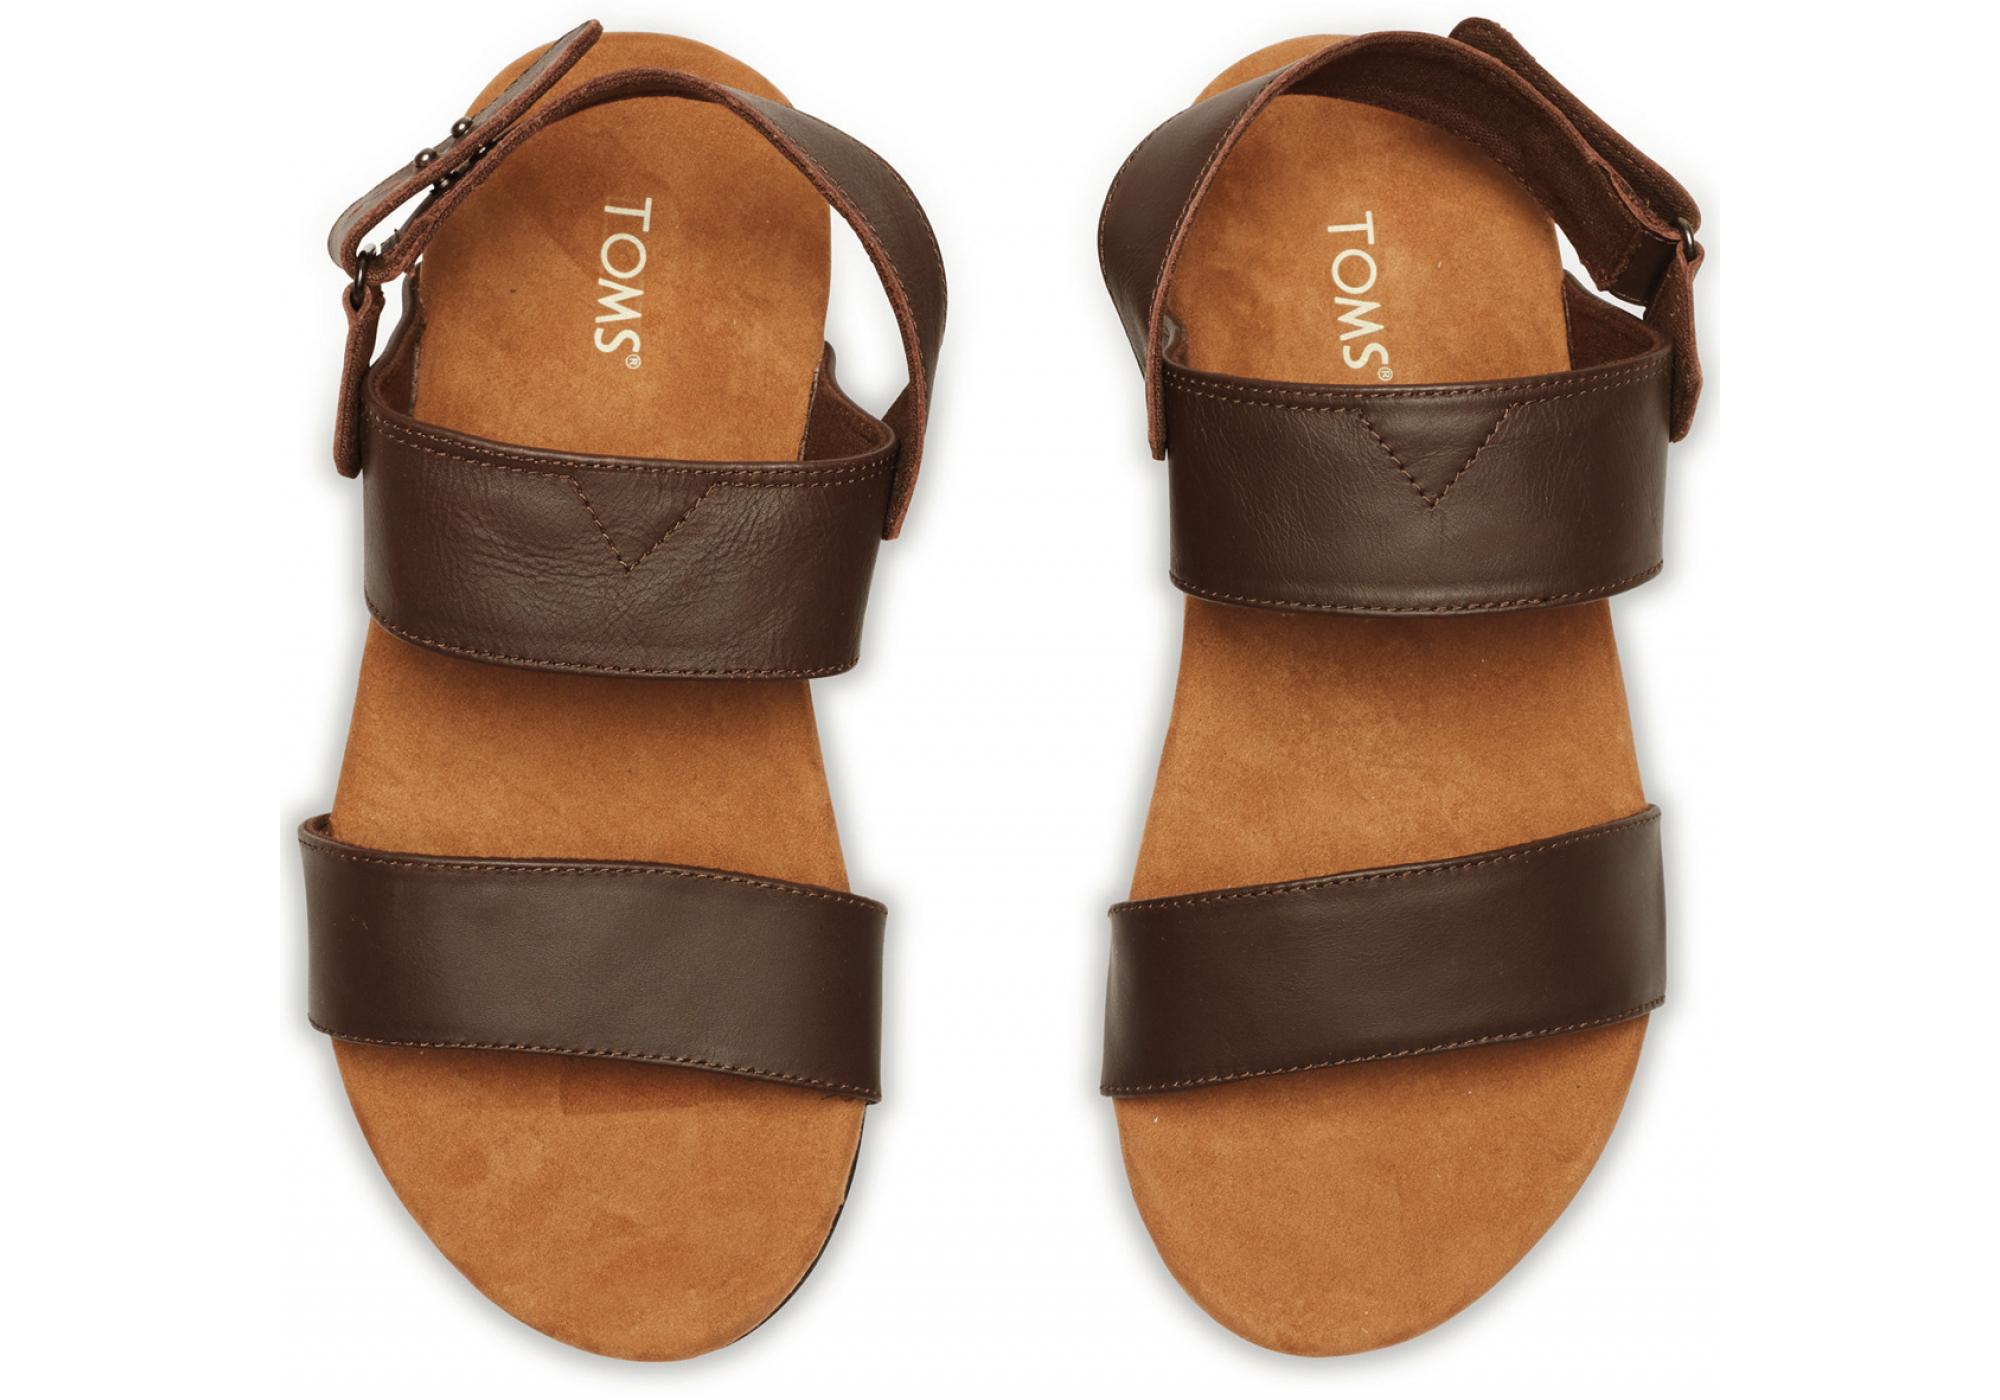 25f163b0c URBANLUX | Hnědé pánské sandále TOMS Moreno